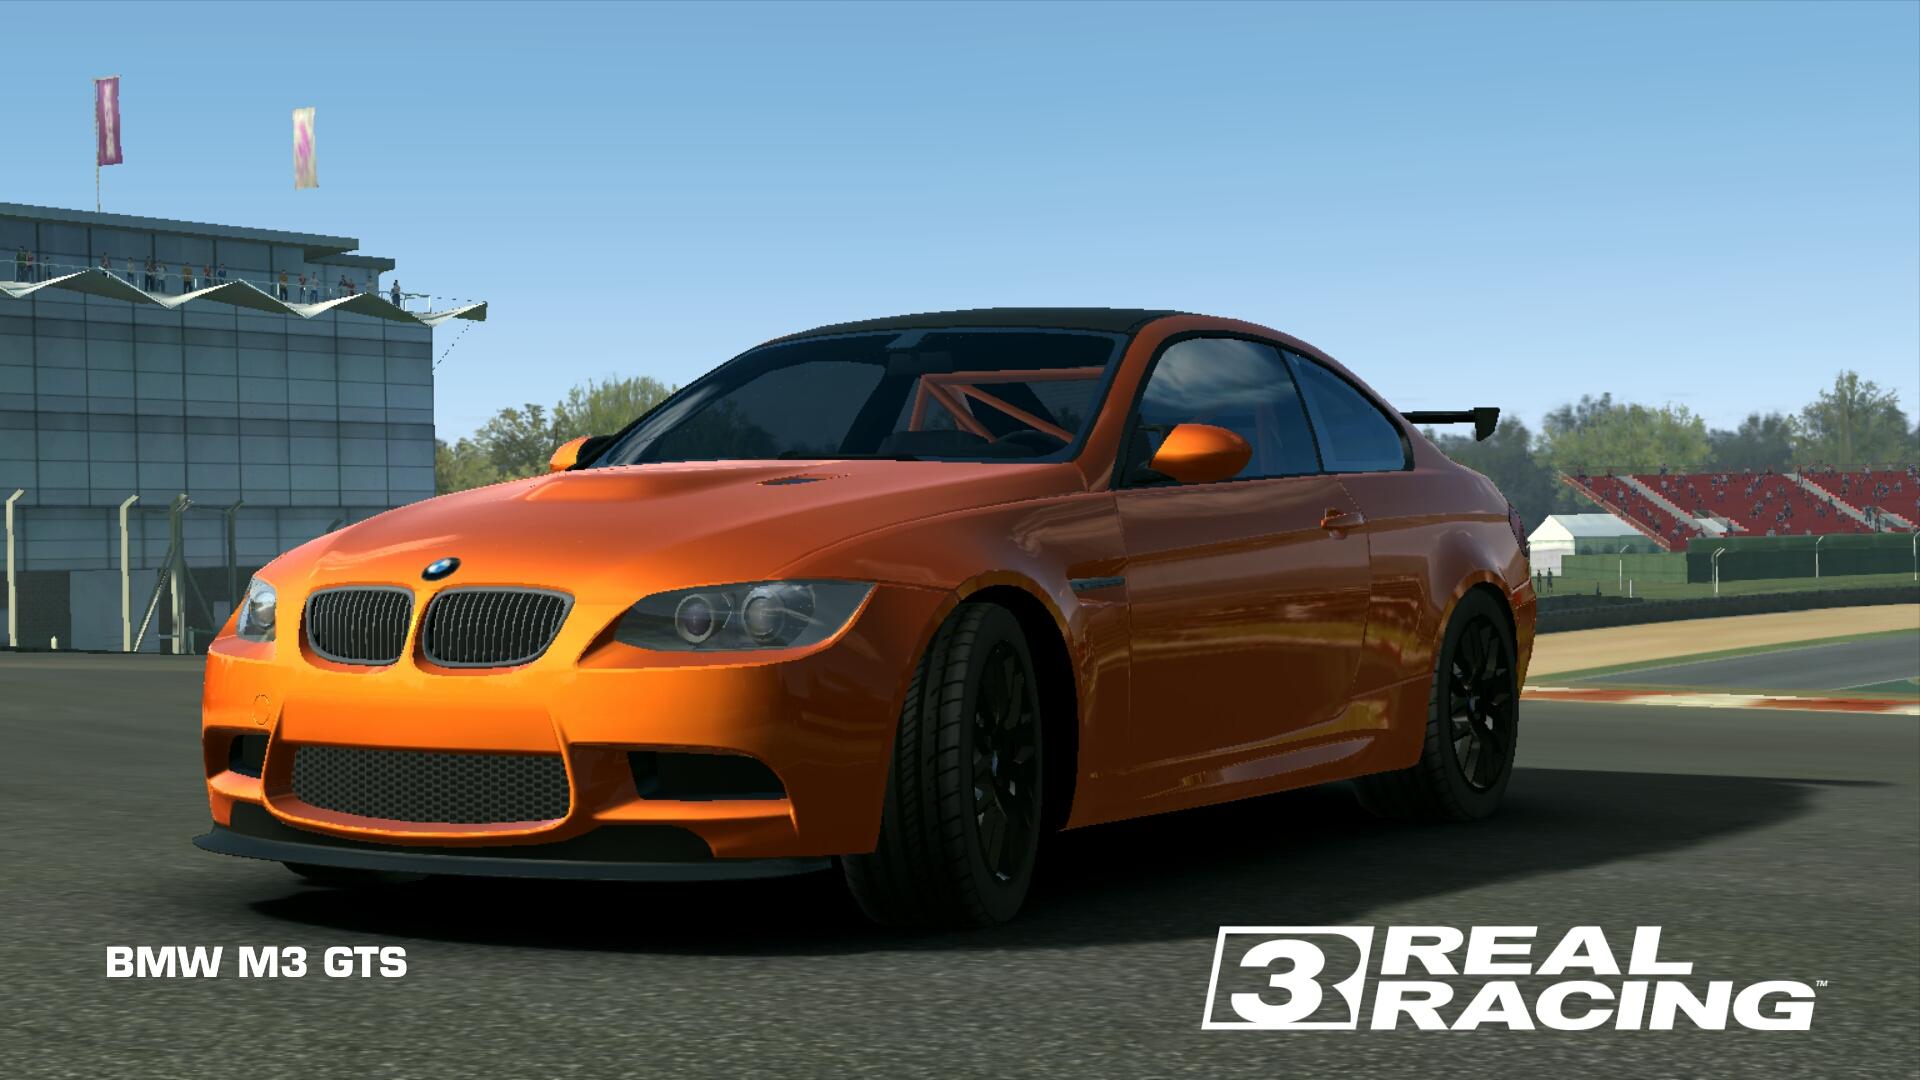 Showcase BMW M3 GTS